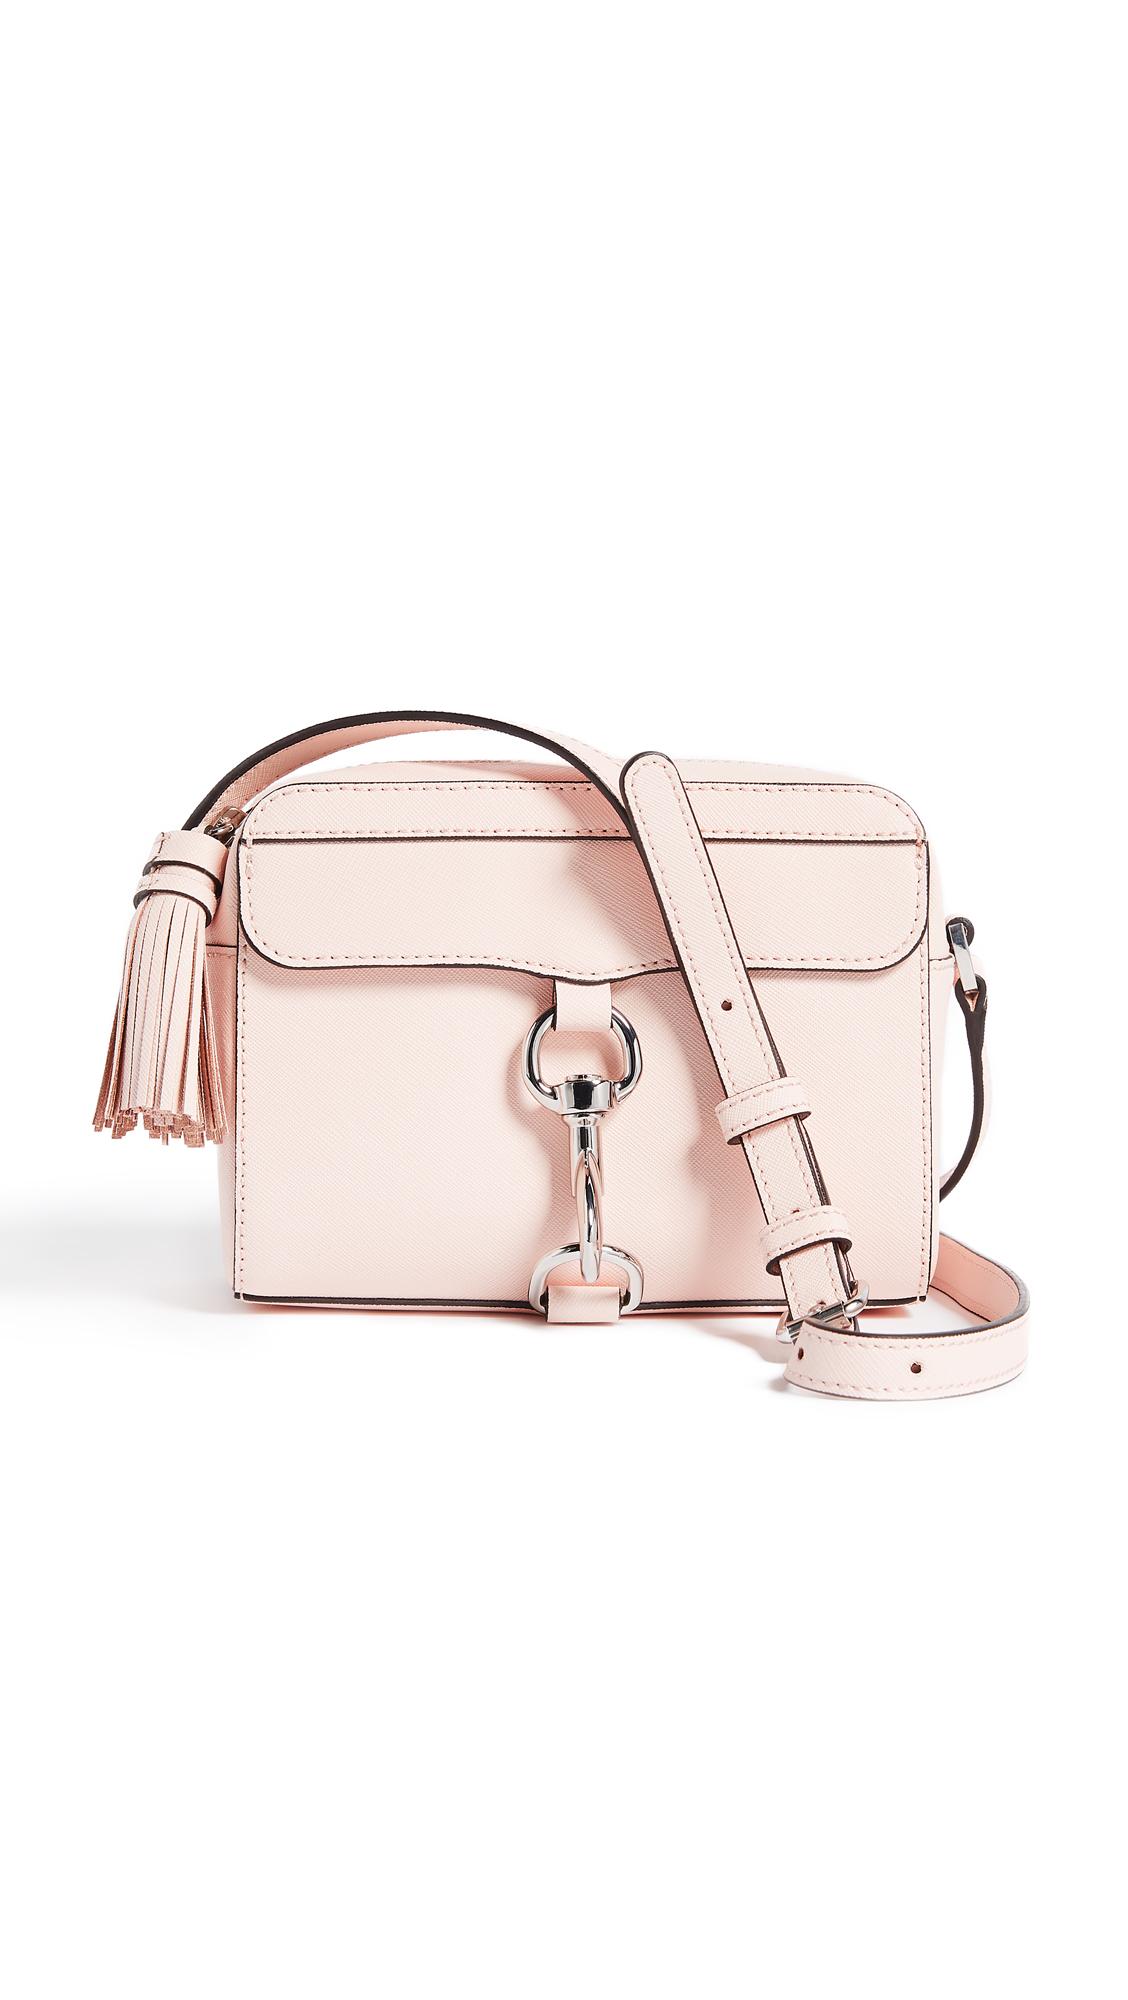 Rebecca Minkoff MAB Camera Bag - Soft Blush